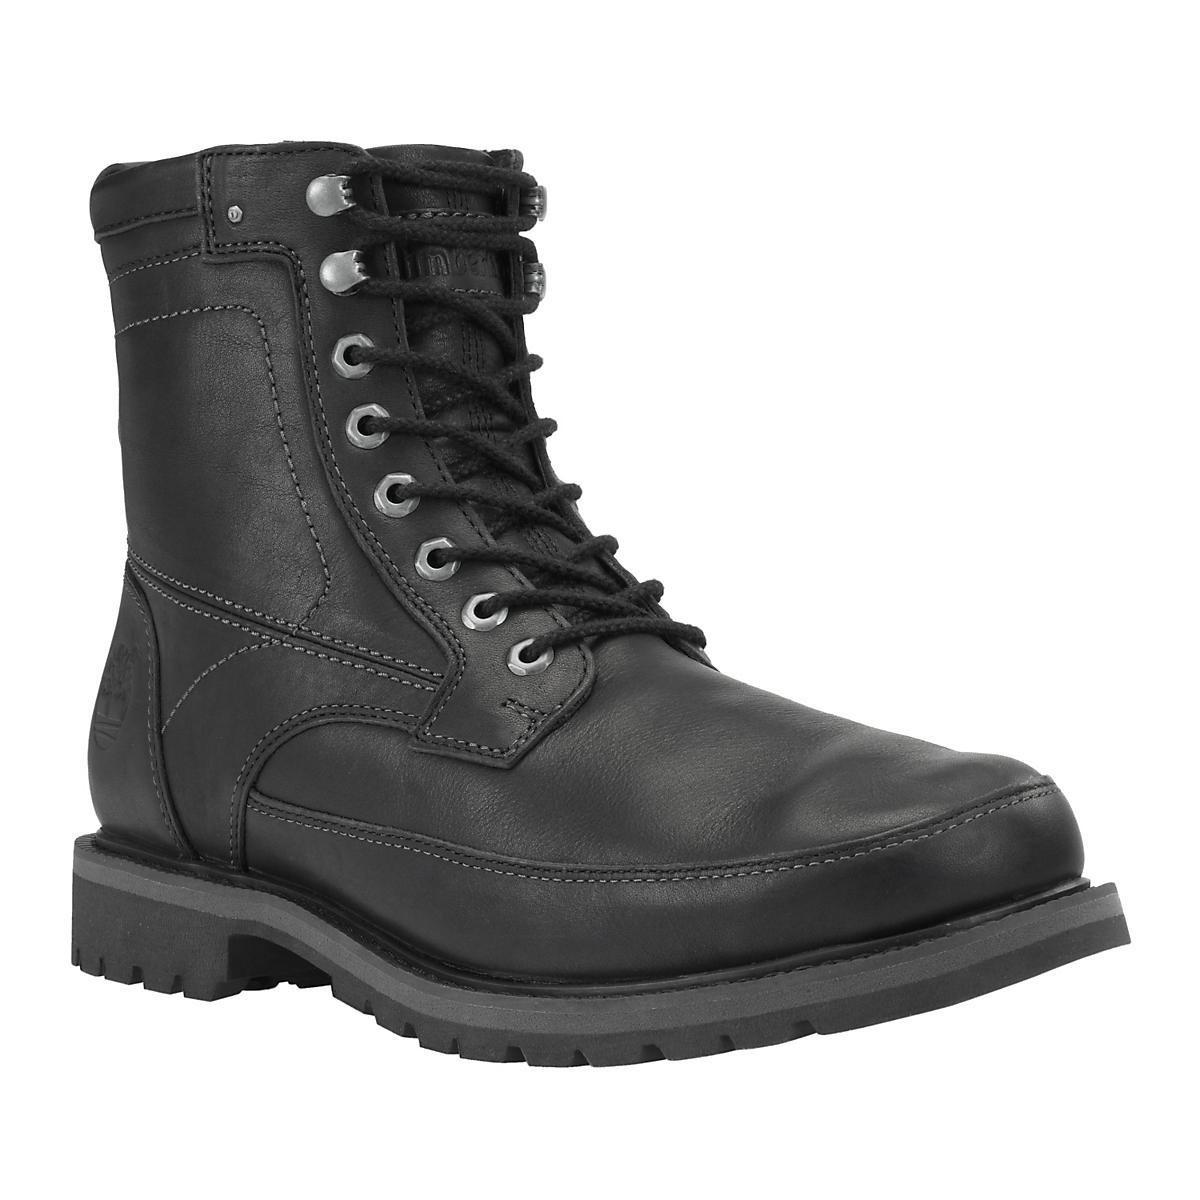 Men's Timberland�EK Chestnut Ridge 6 Boot Waterproof